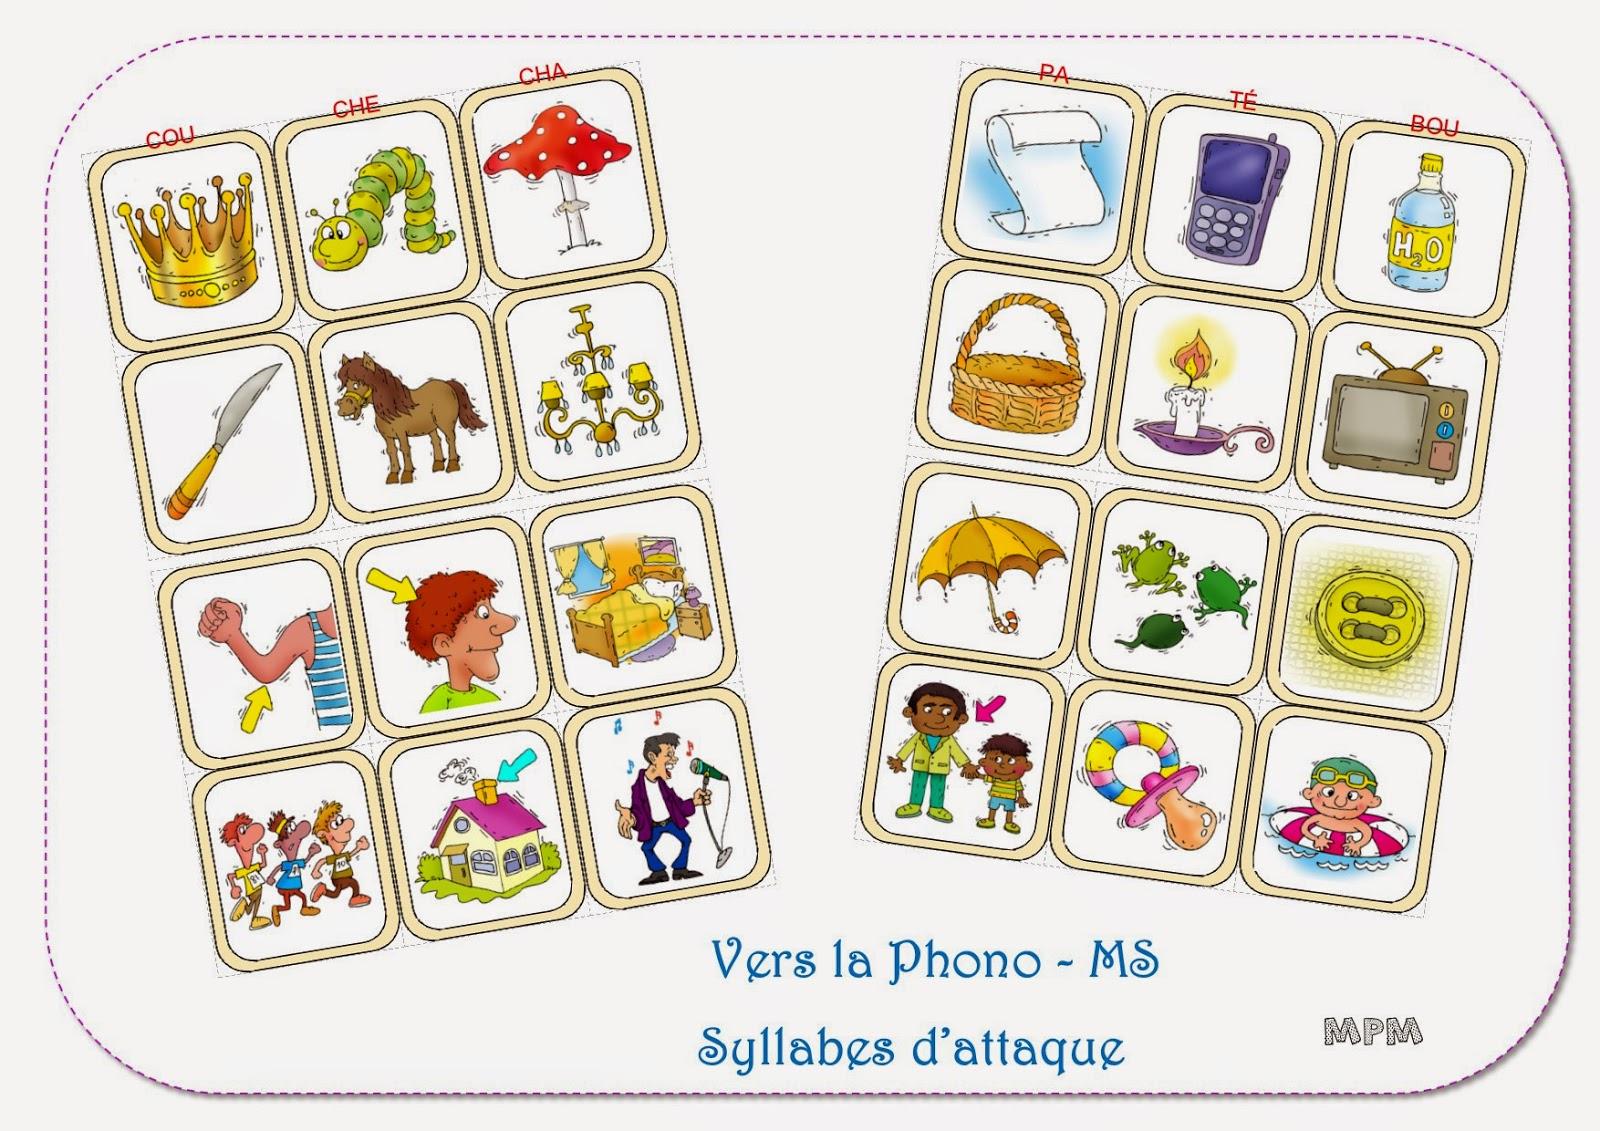 Phonologie MS jeu de syllabes